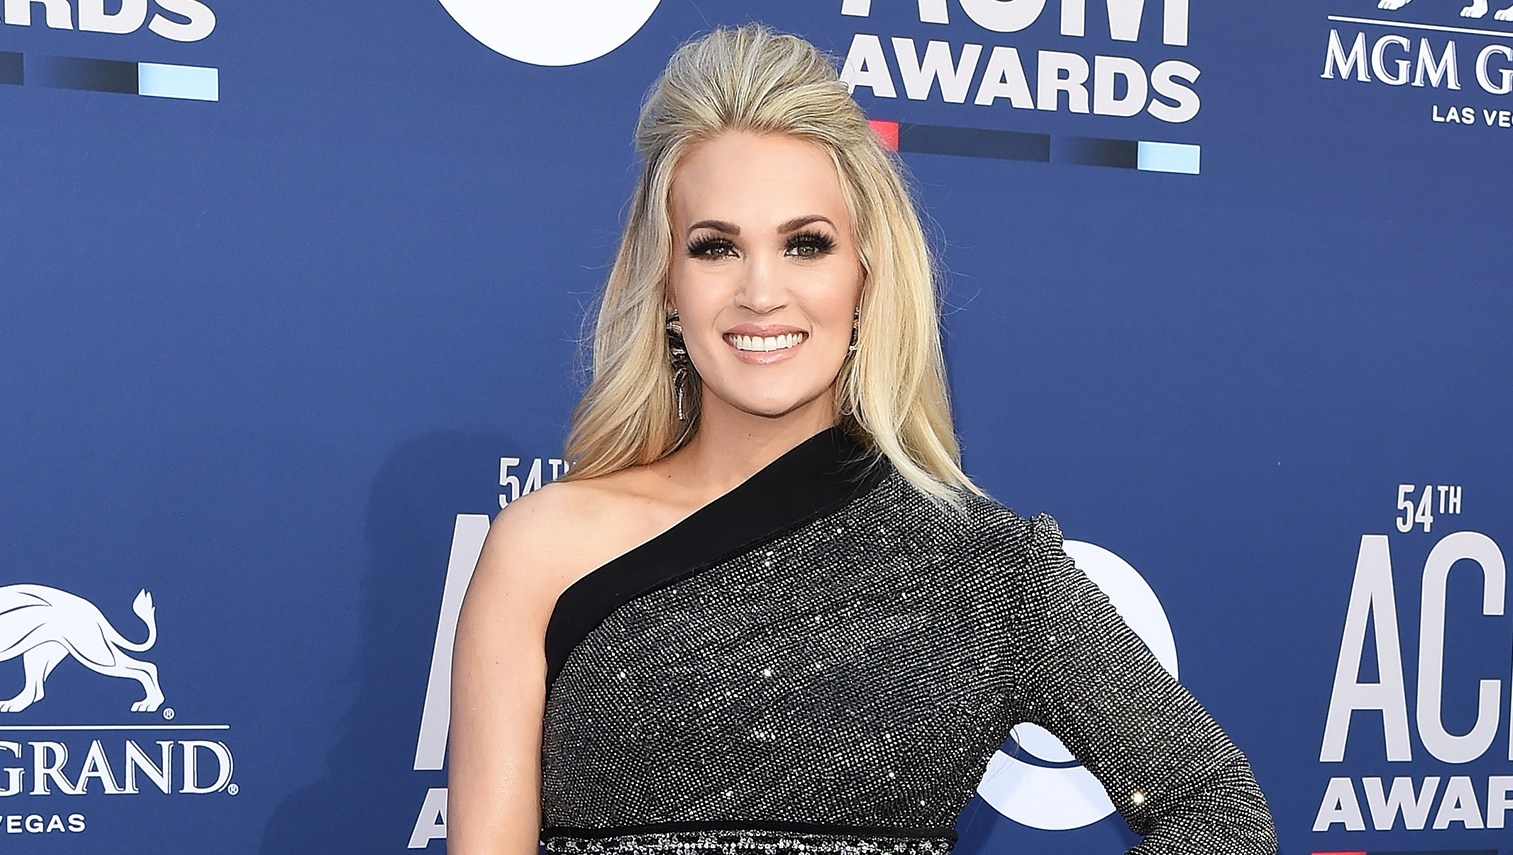 Carrie Underwood Son Isaiah Crush